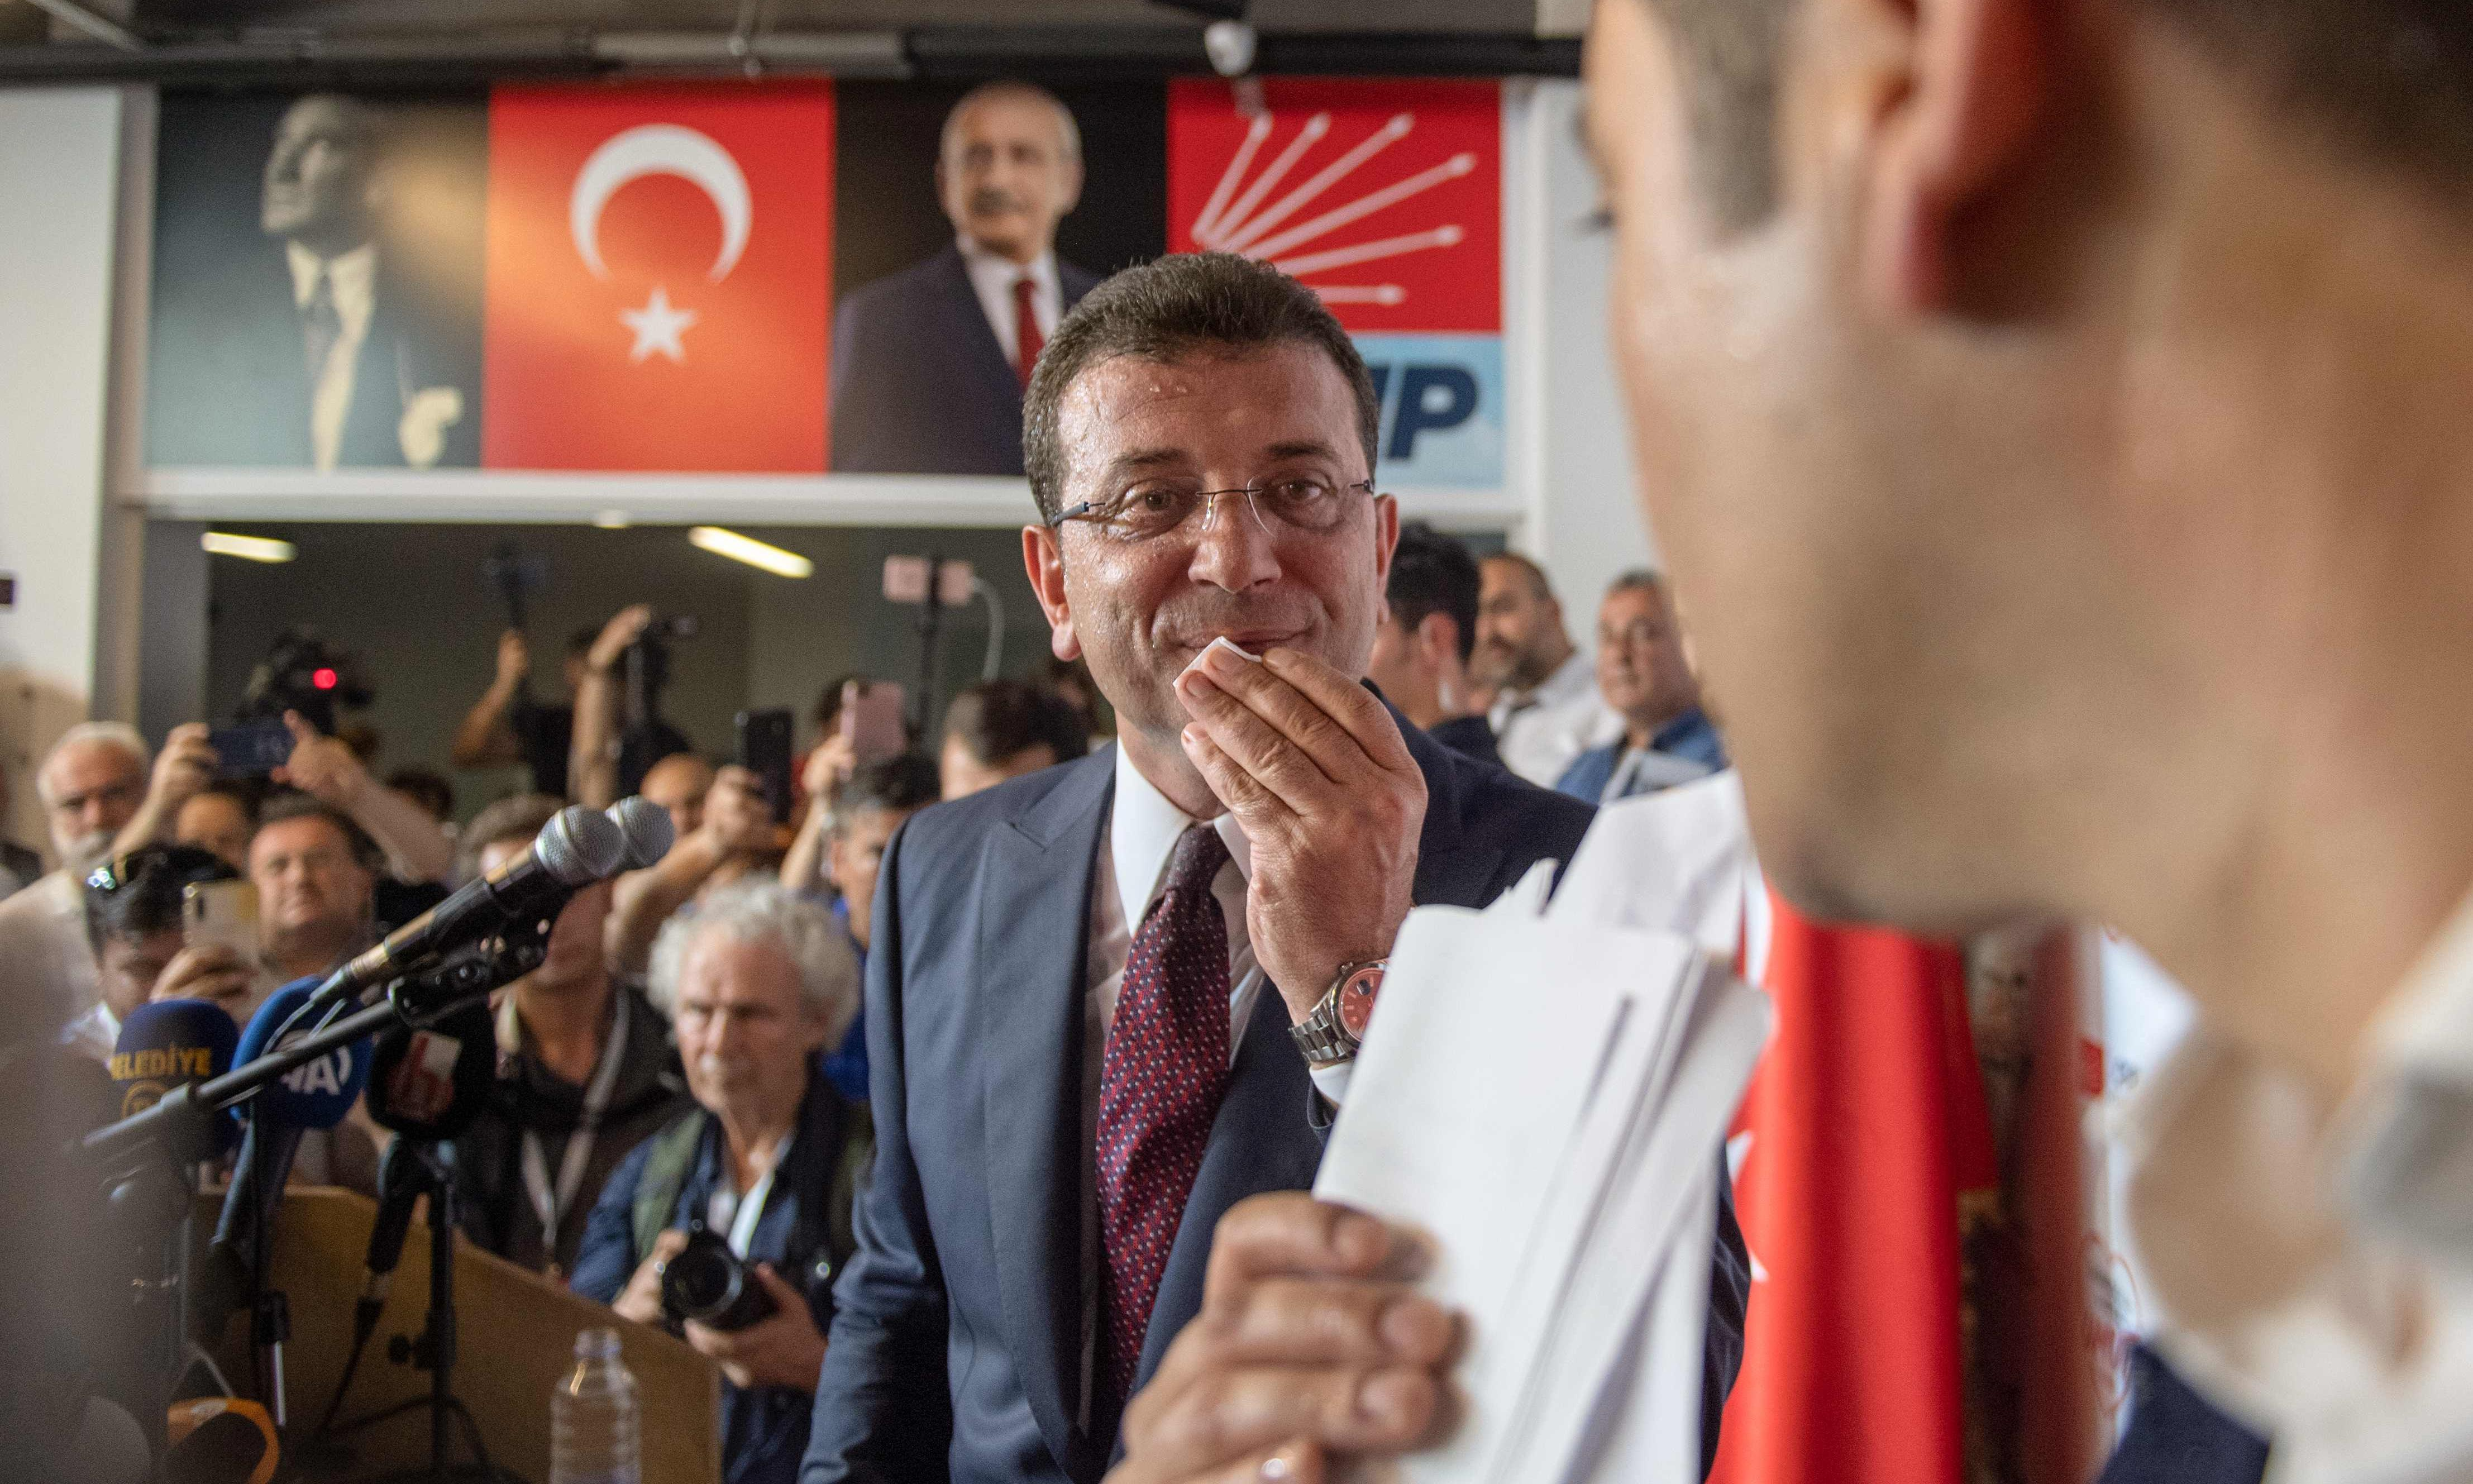 Ekrem İmamoğlu defeats AKP in Istanbul mayoral election